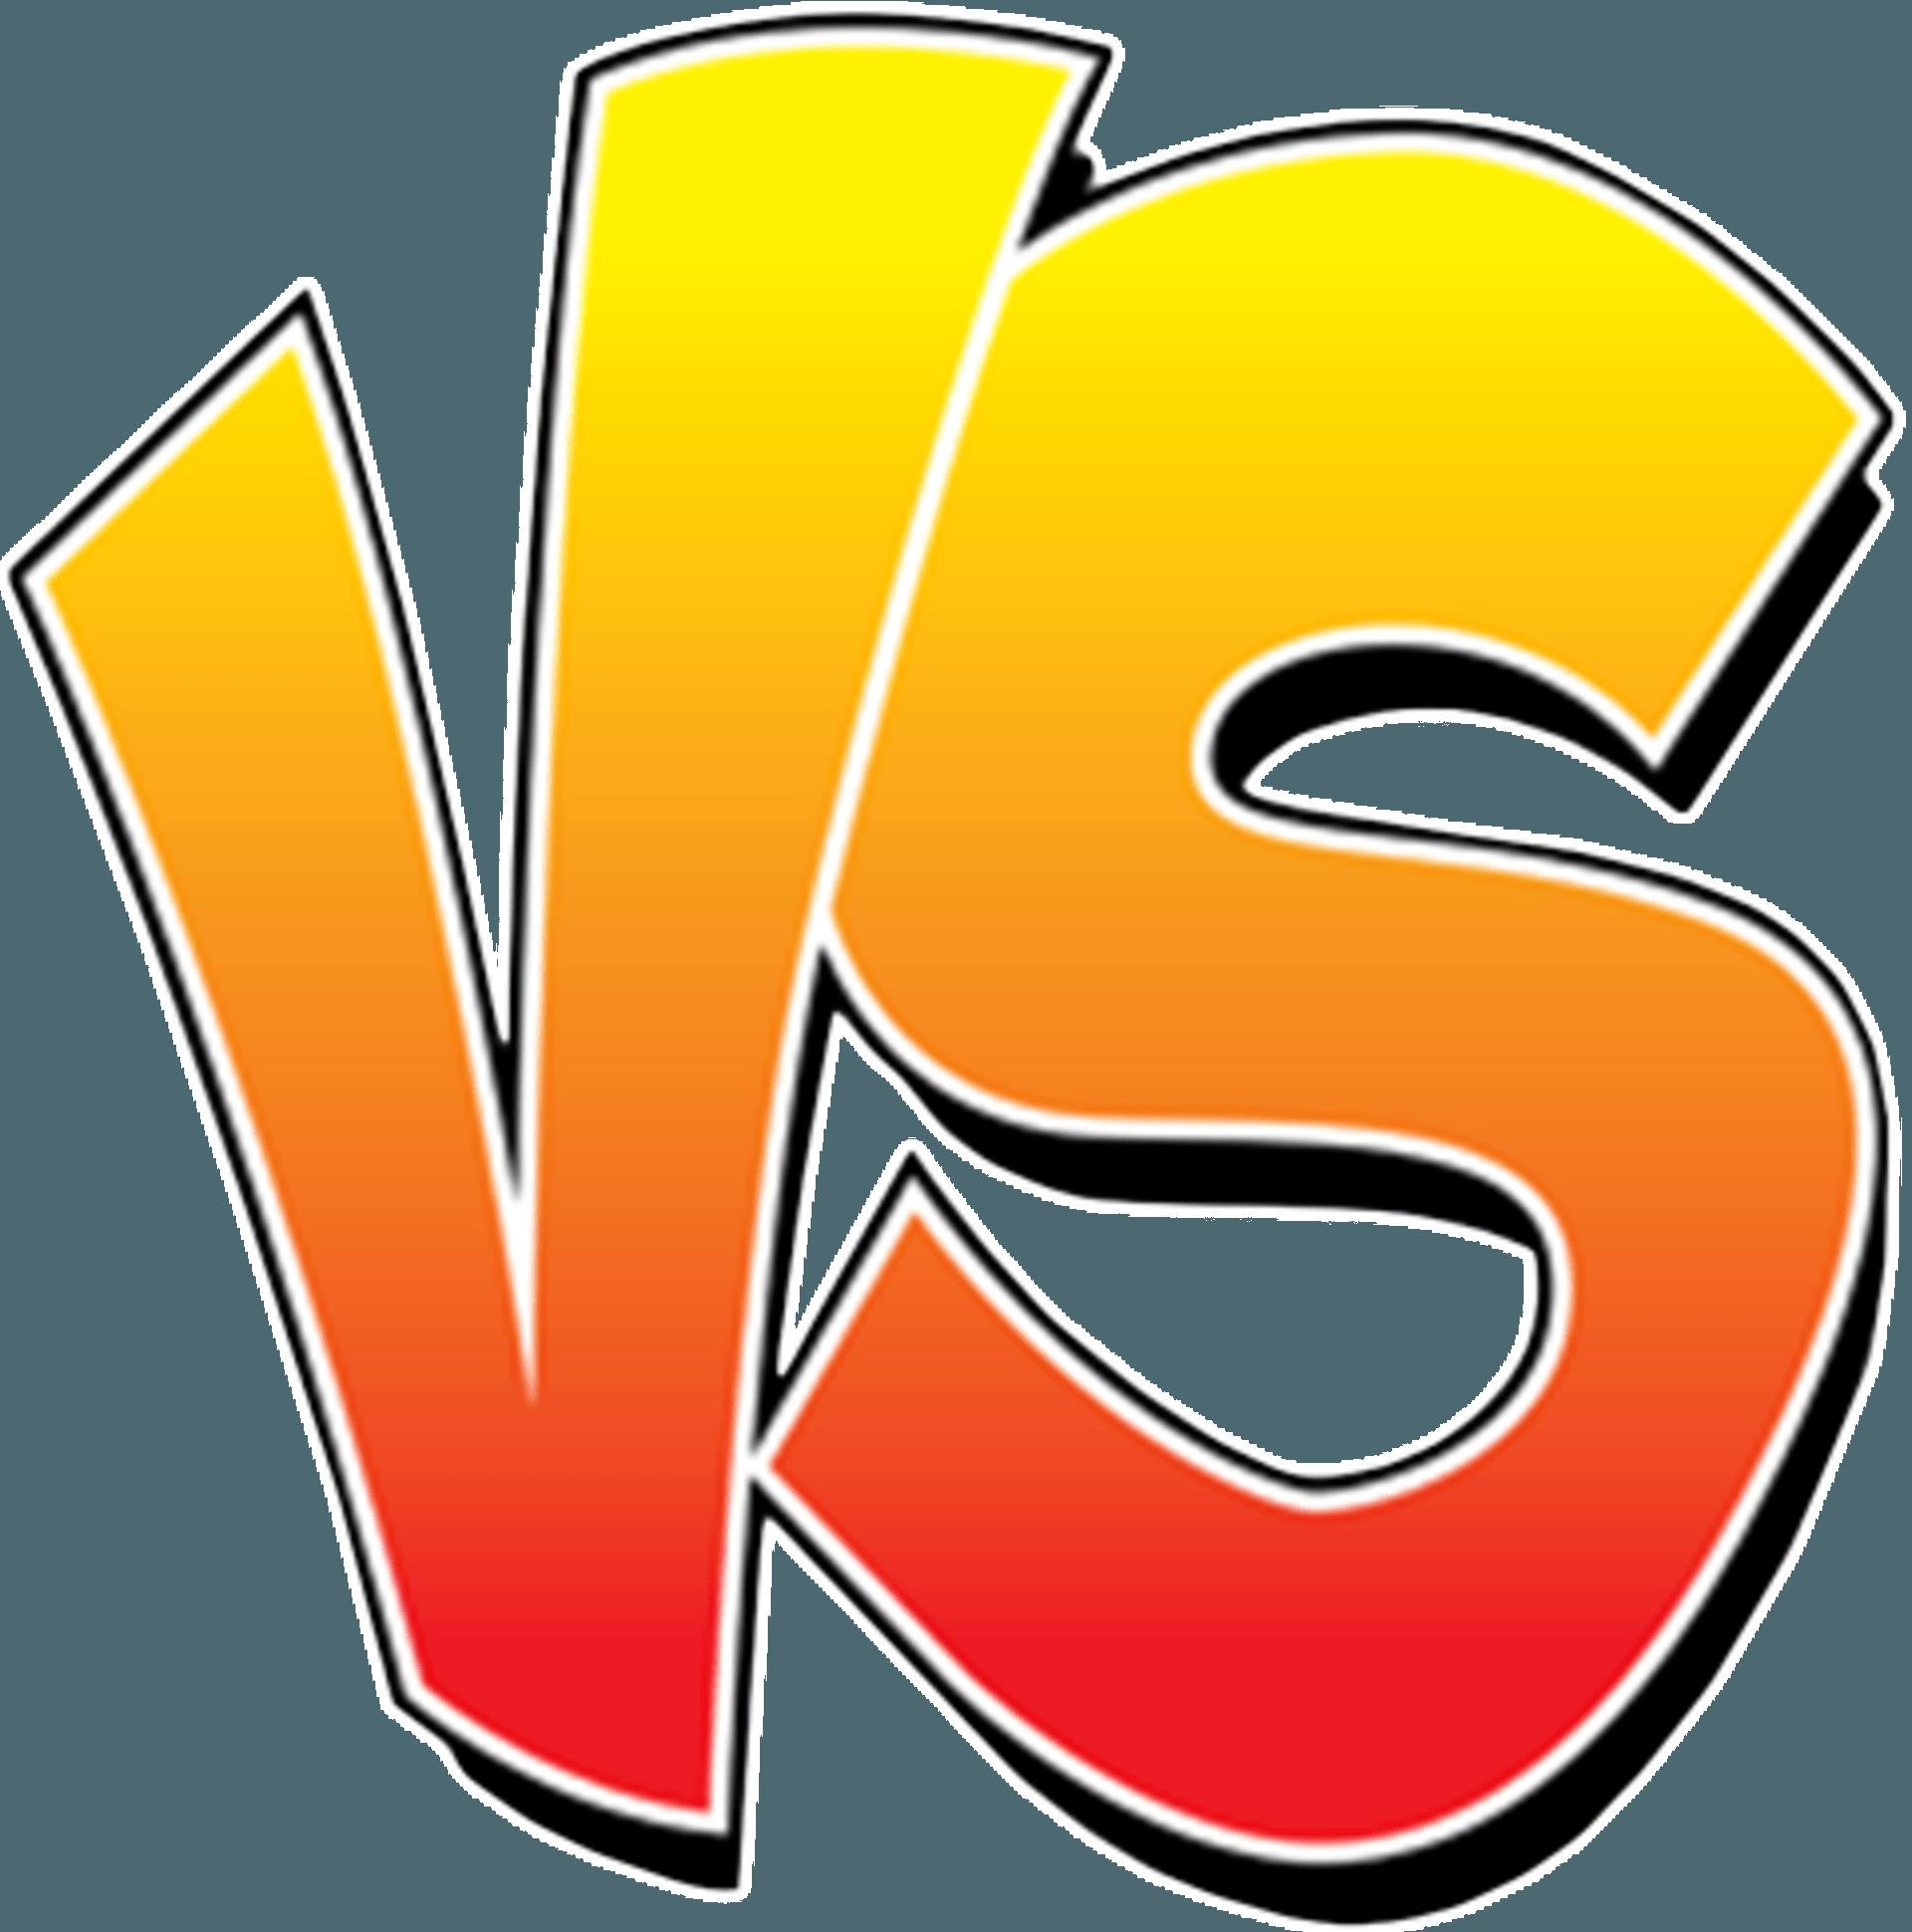 Versus logo clipart transparent clipart free Versus Logo - LogoDix clipart free